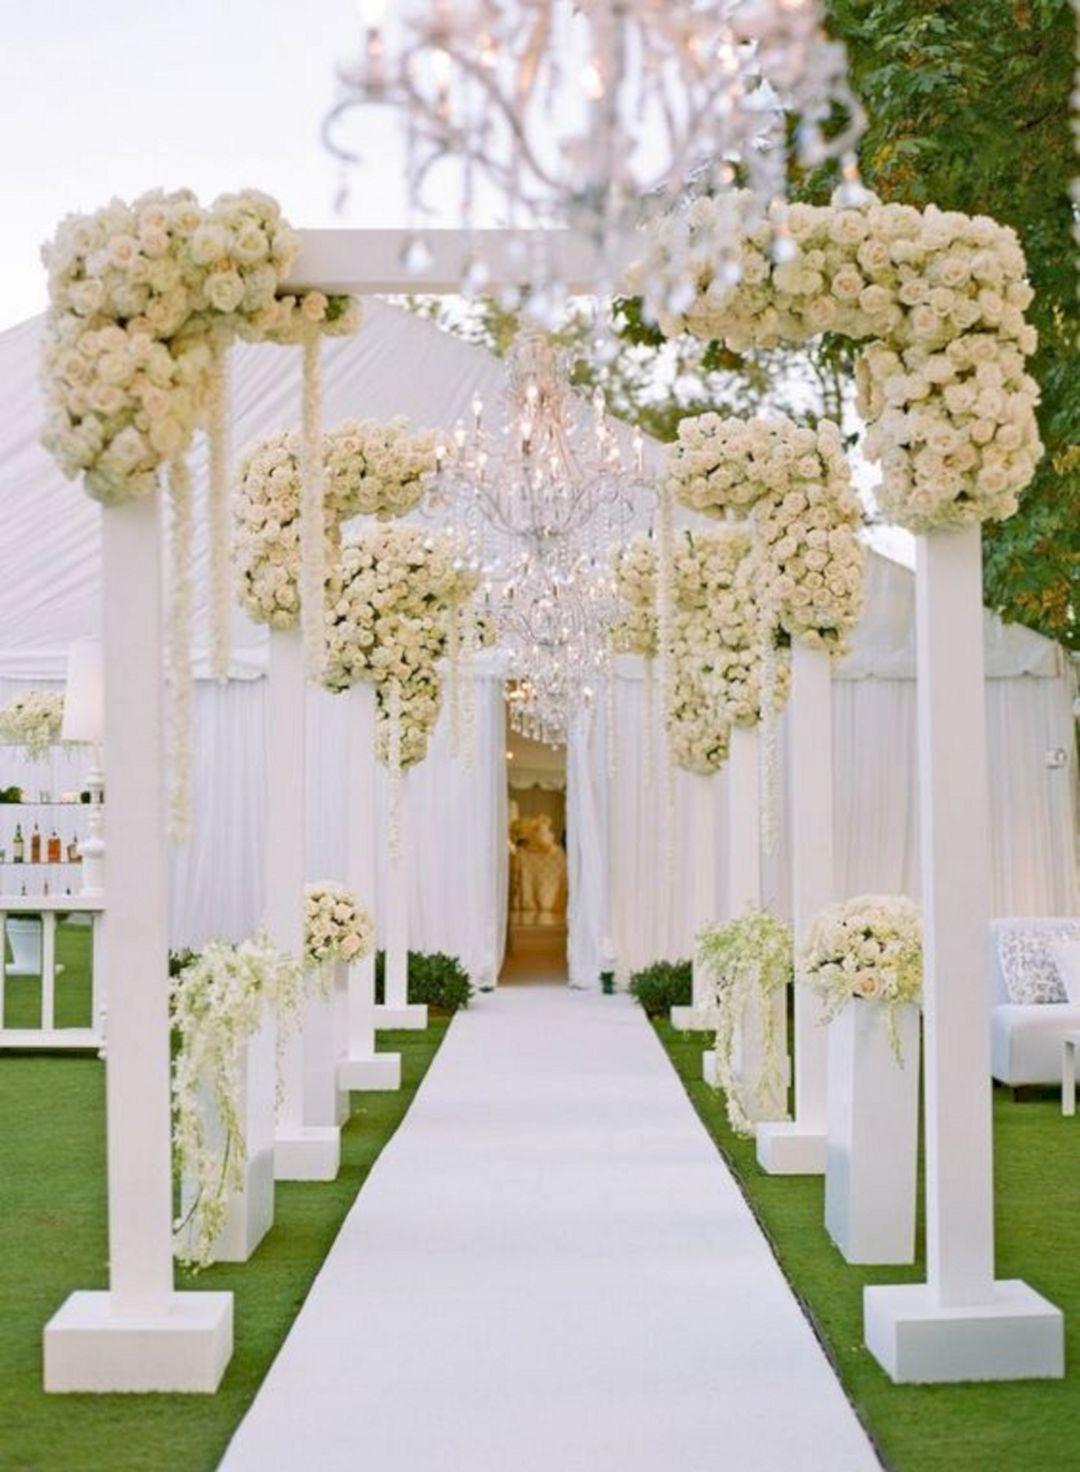 Wedding entry decoration ideas   Amazing Wedding Entrance Decoration For Perfect Wedding Party